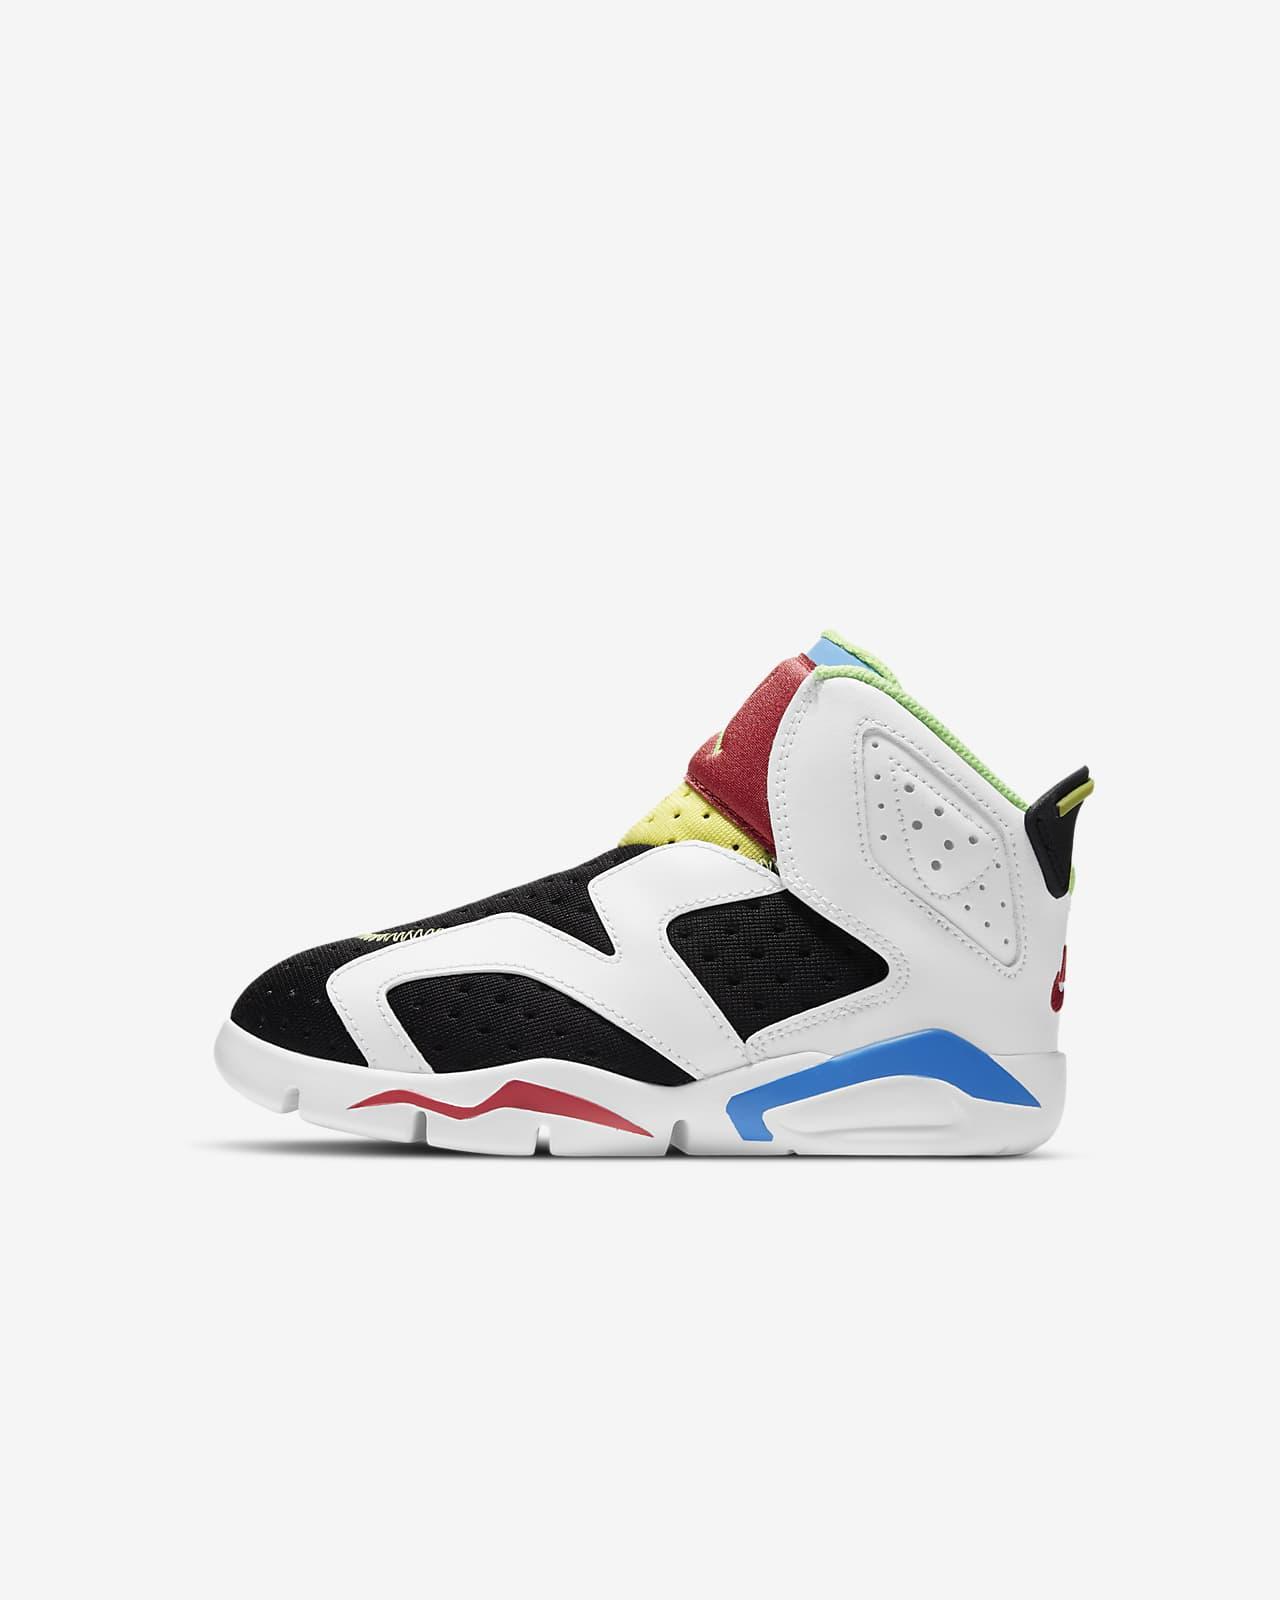 Jordan 6 Retro Little Flex PS 复刻幼童运动童鞋